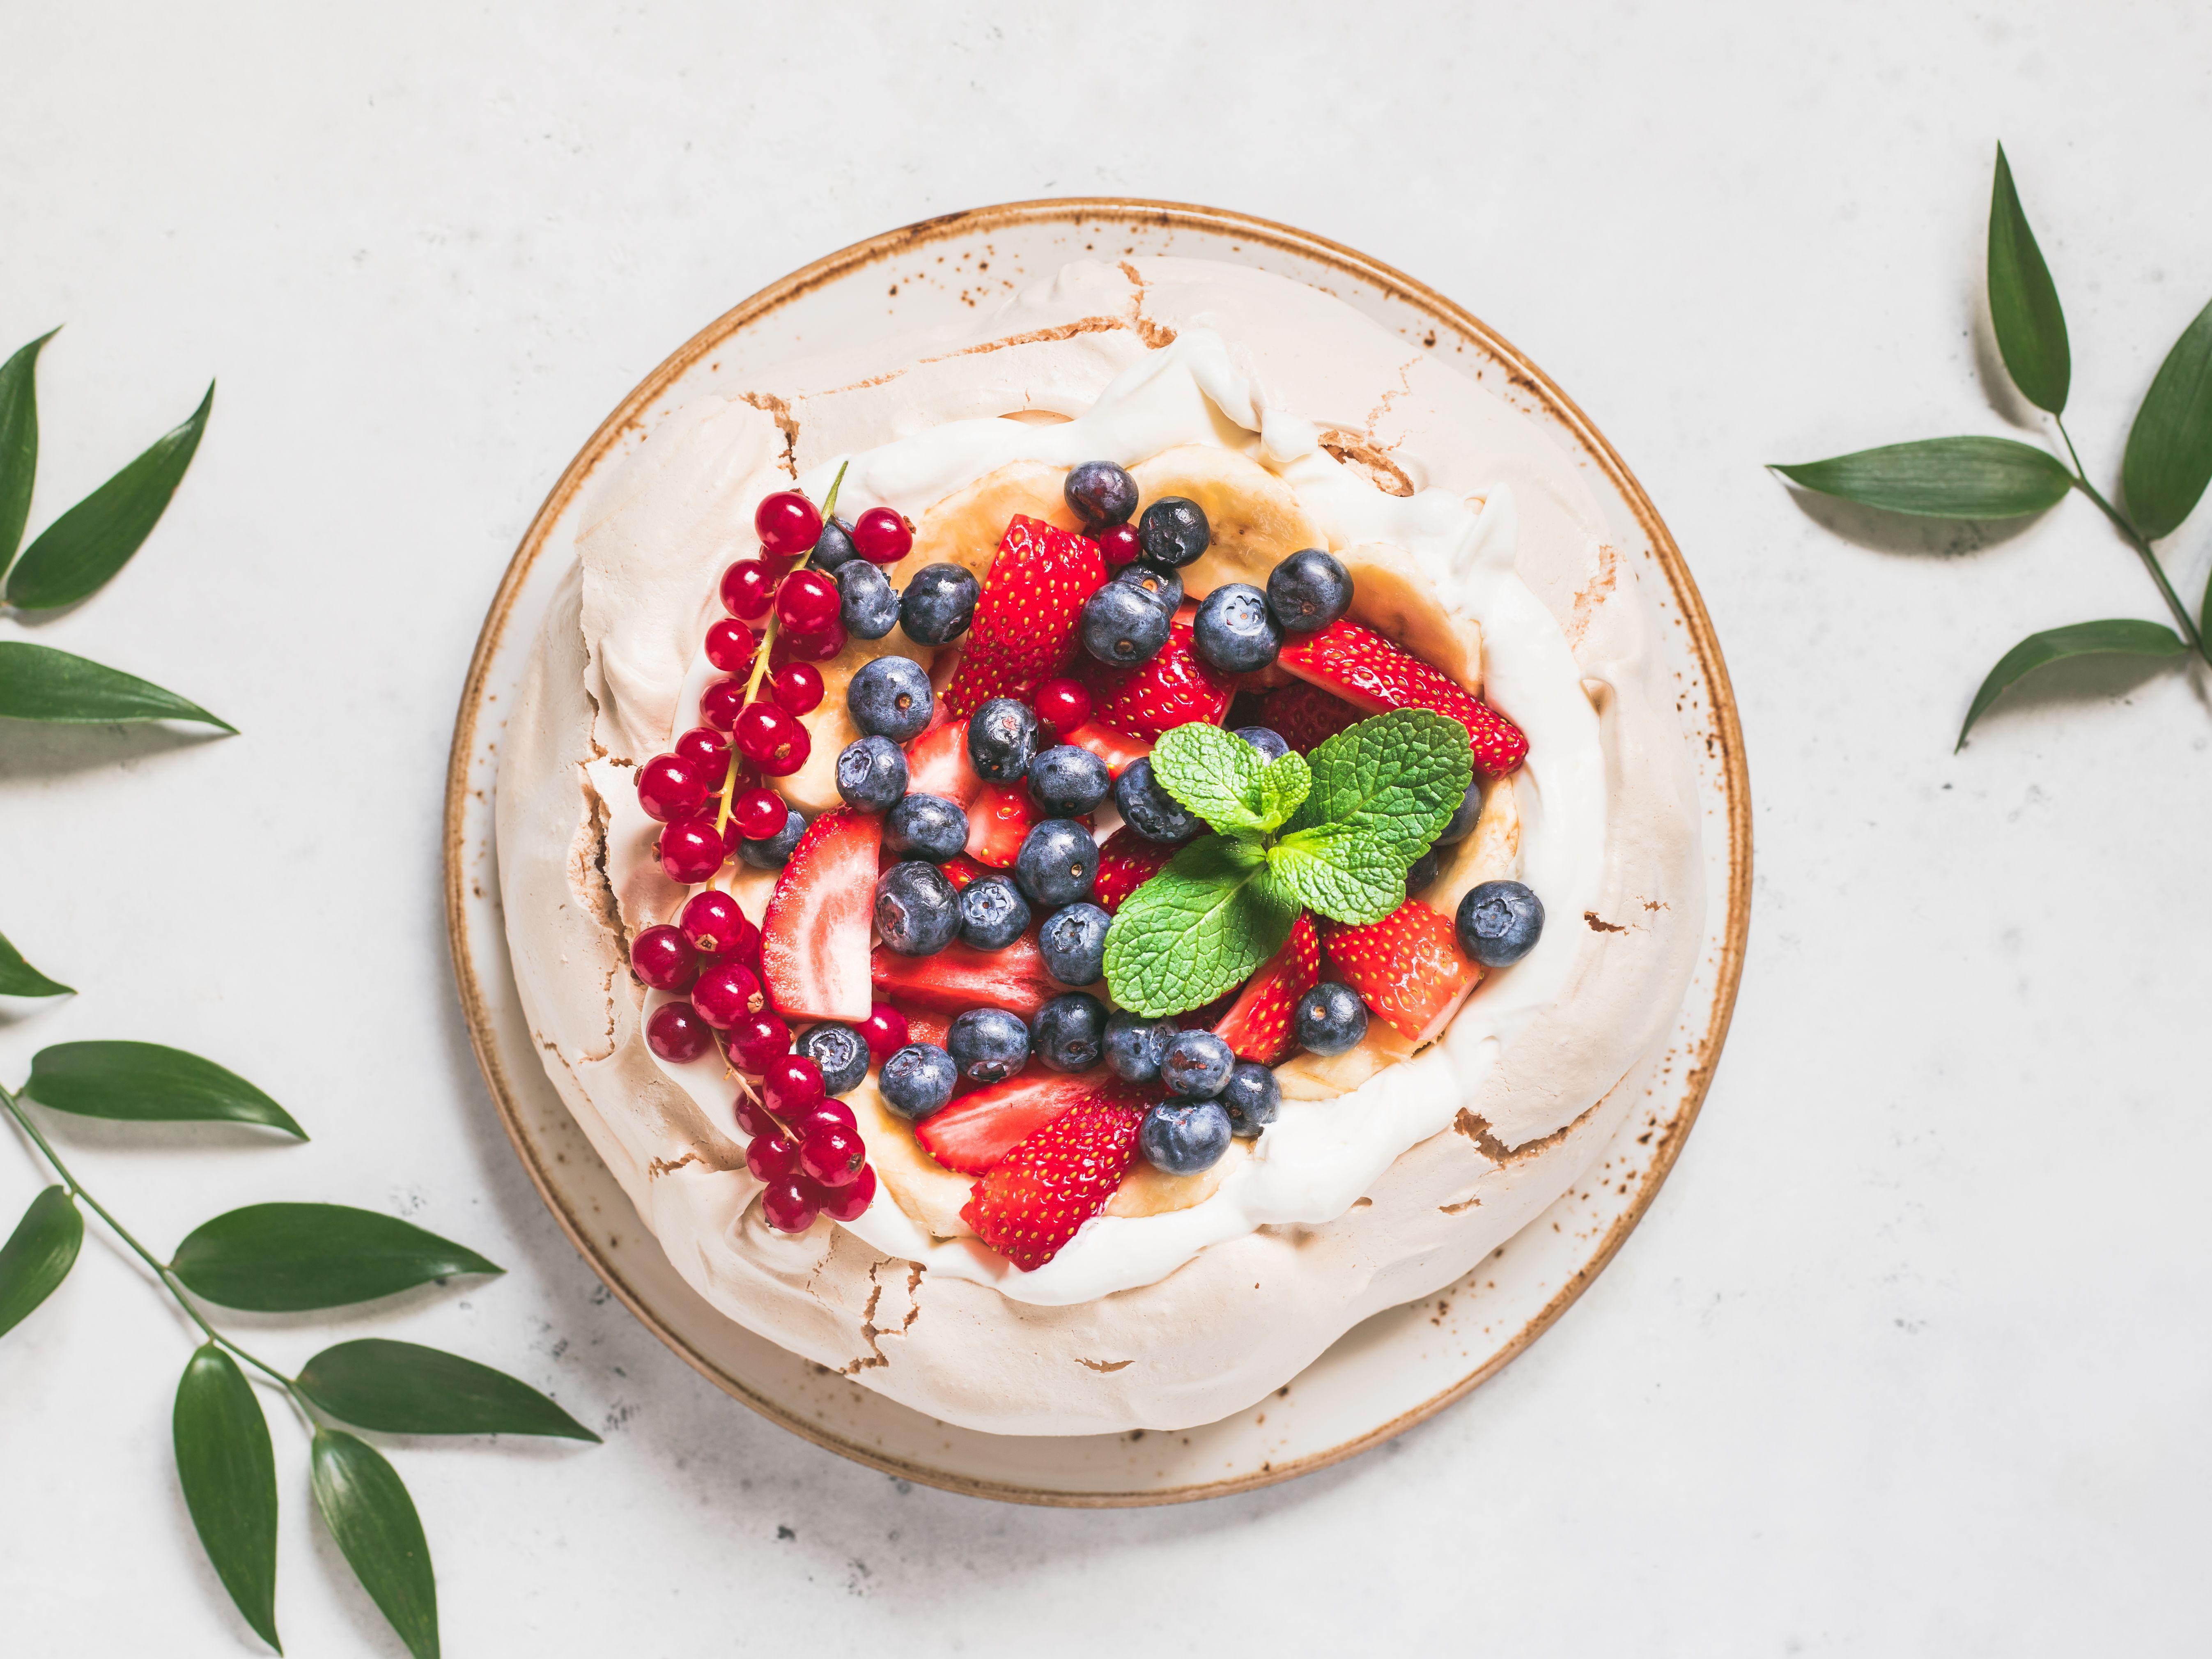 New Zealand Pavlova (meringue, whipped cream, and fruit)